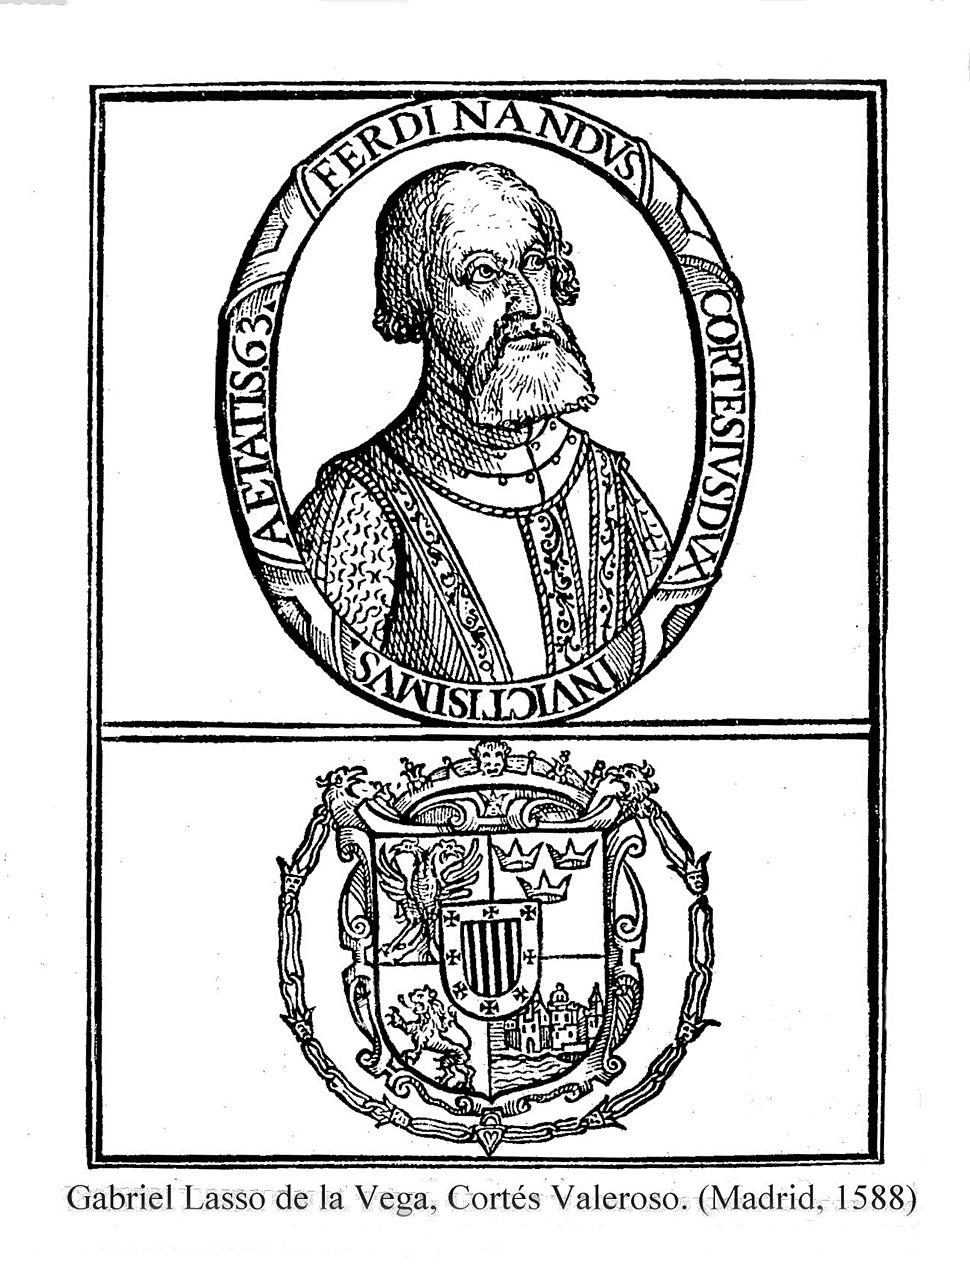 Hernando Cortes crest from Charles V